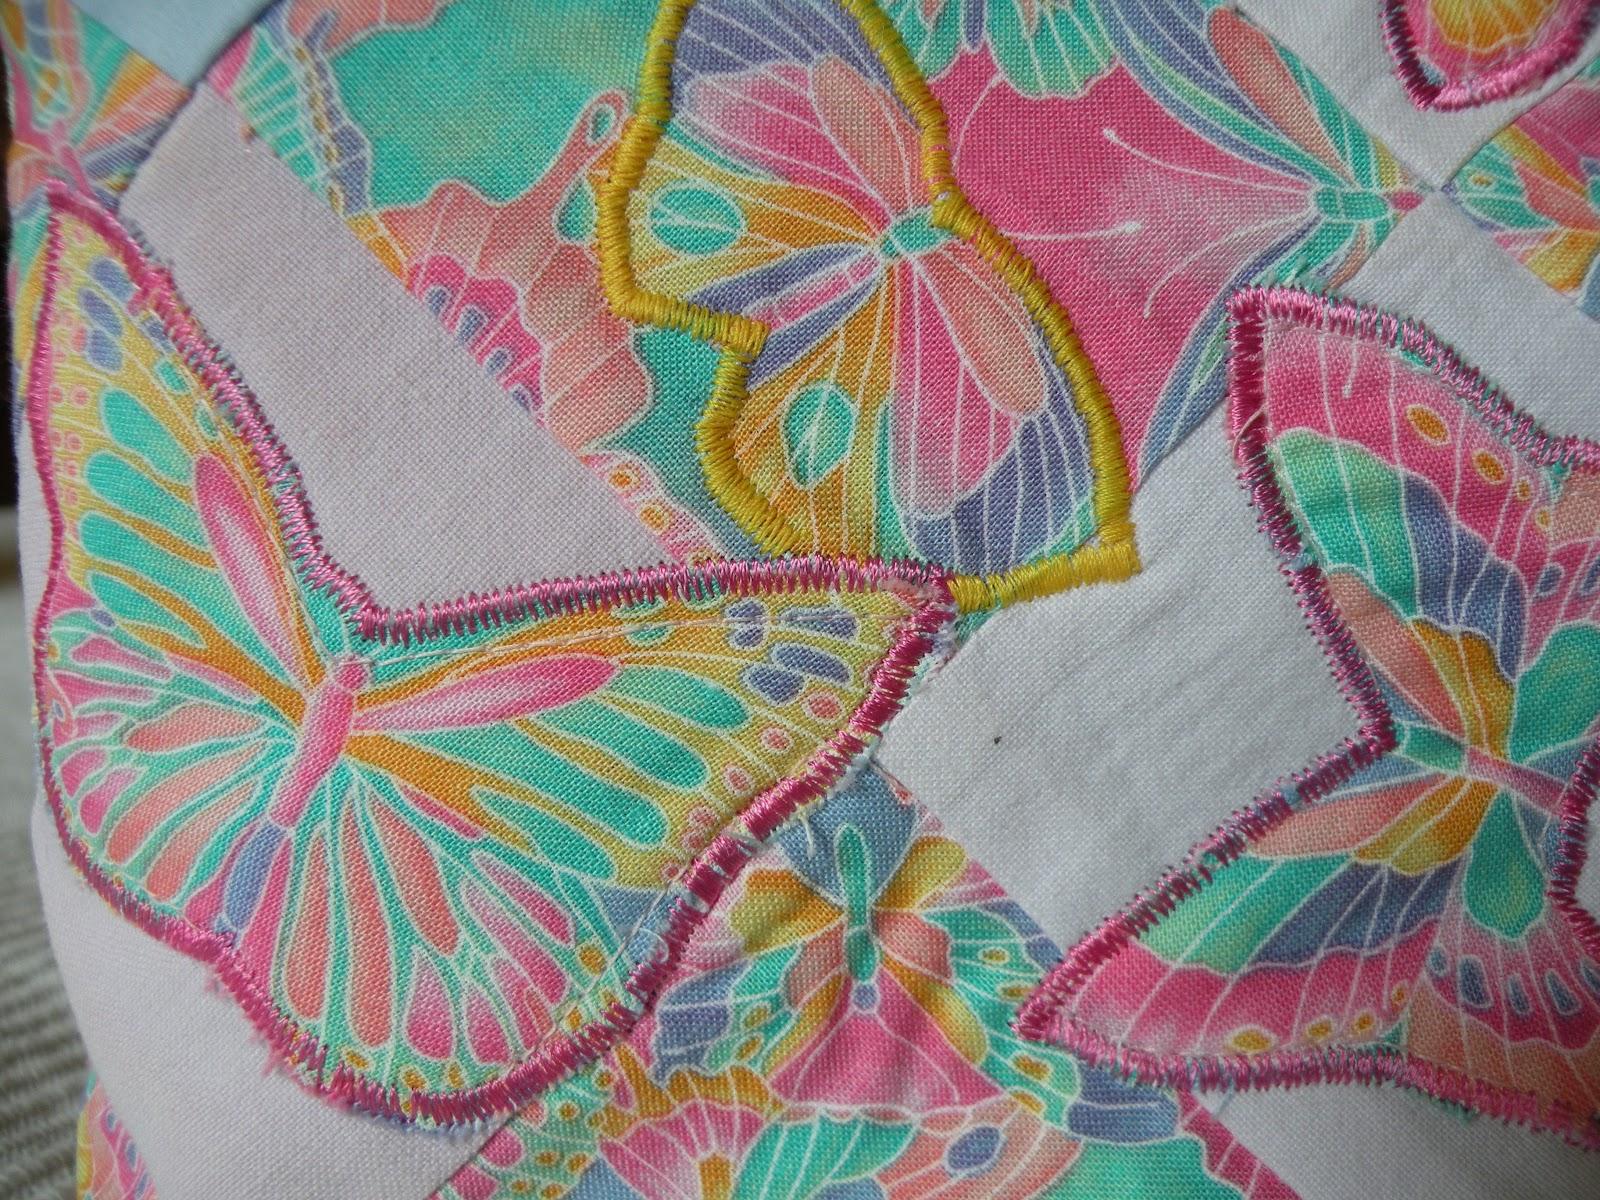 aplikoituja perhosia